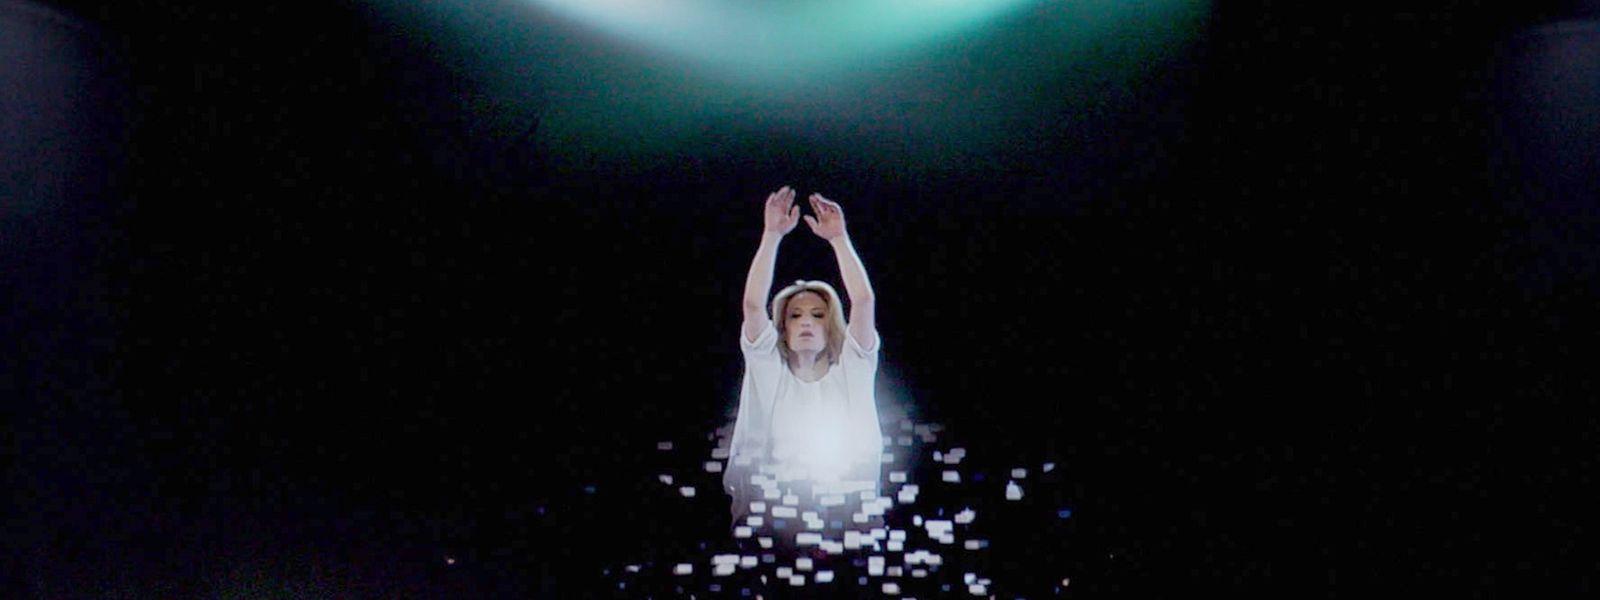 Sylvia Camarda als tanzendes Hologramm.